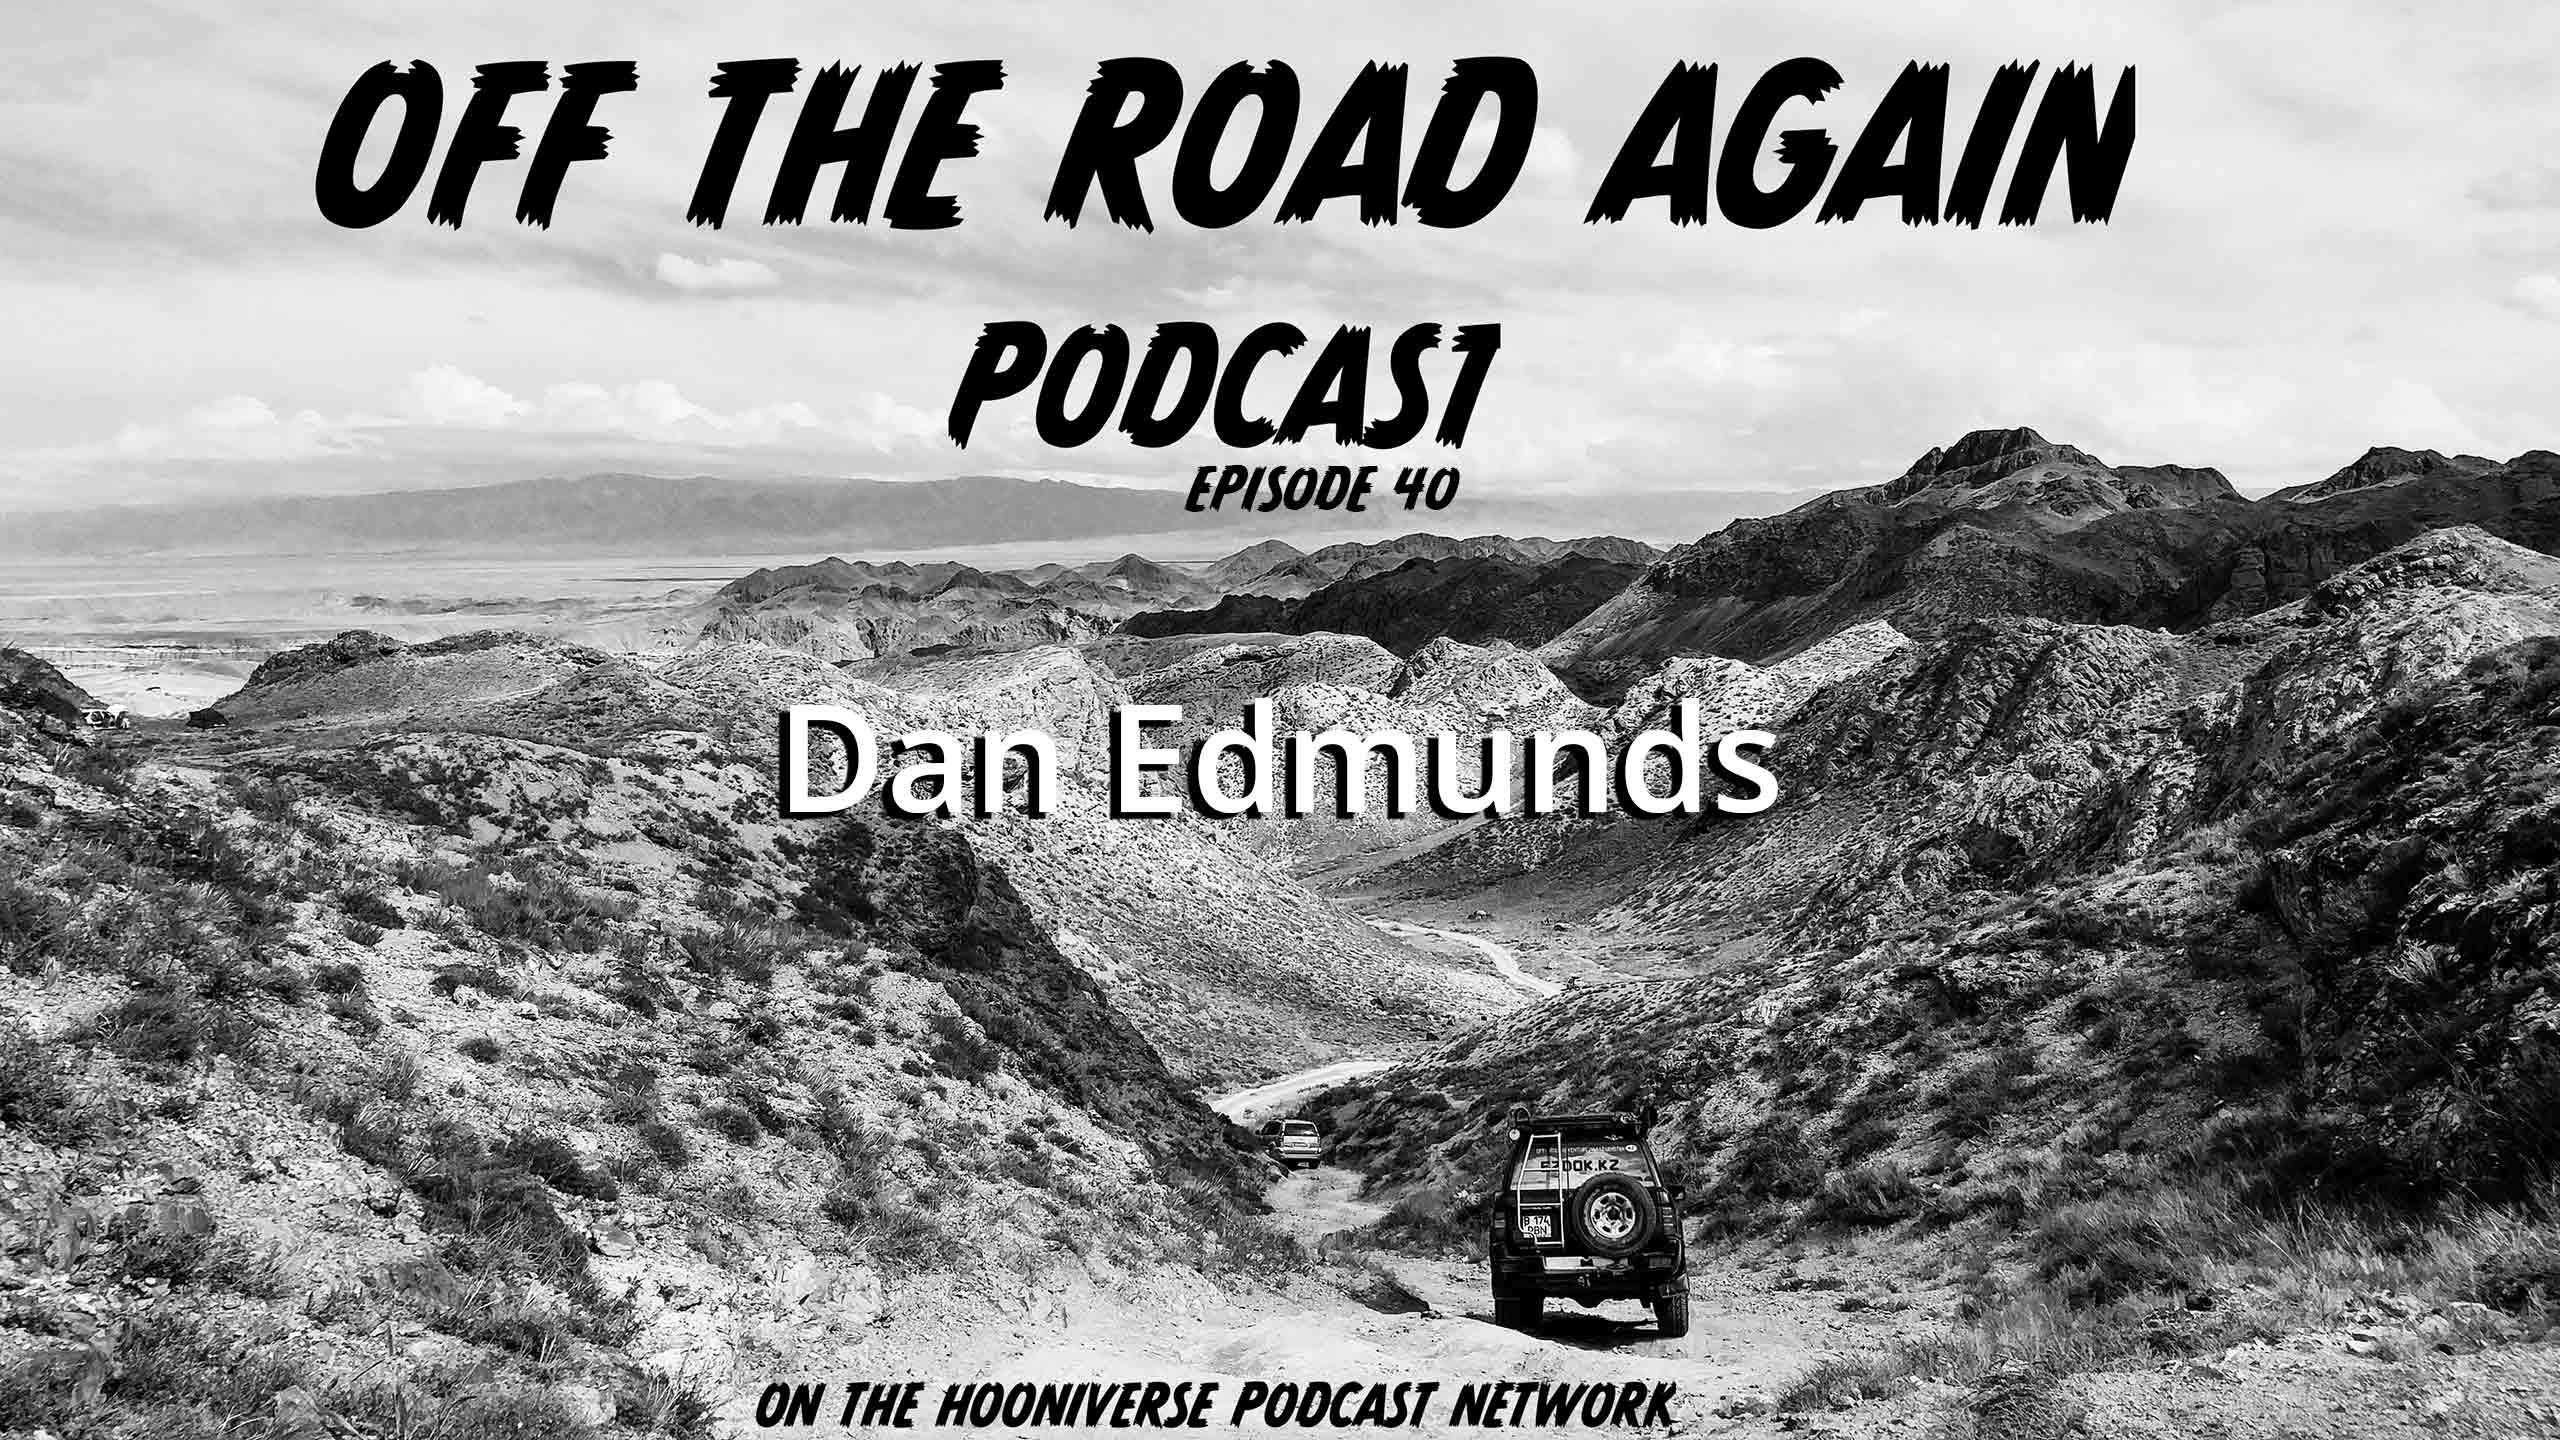 Dan-Edmunds-Off-The-Road-Again-Podcast-Episode-40